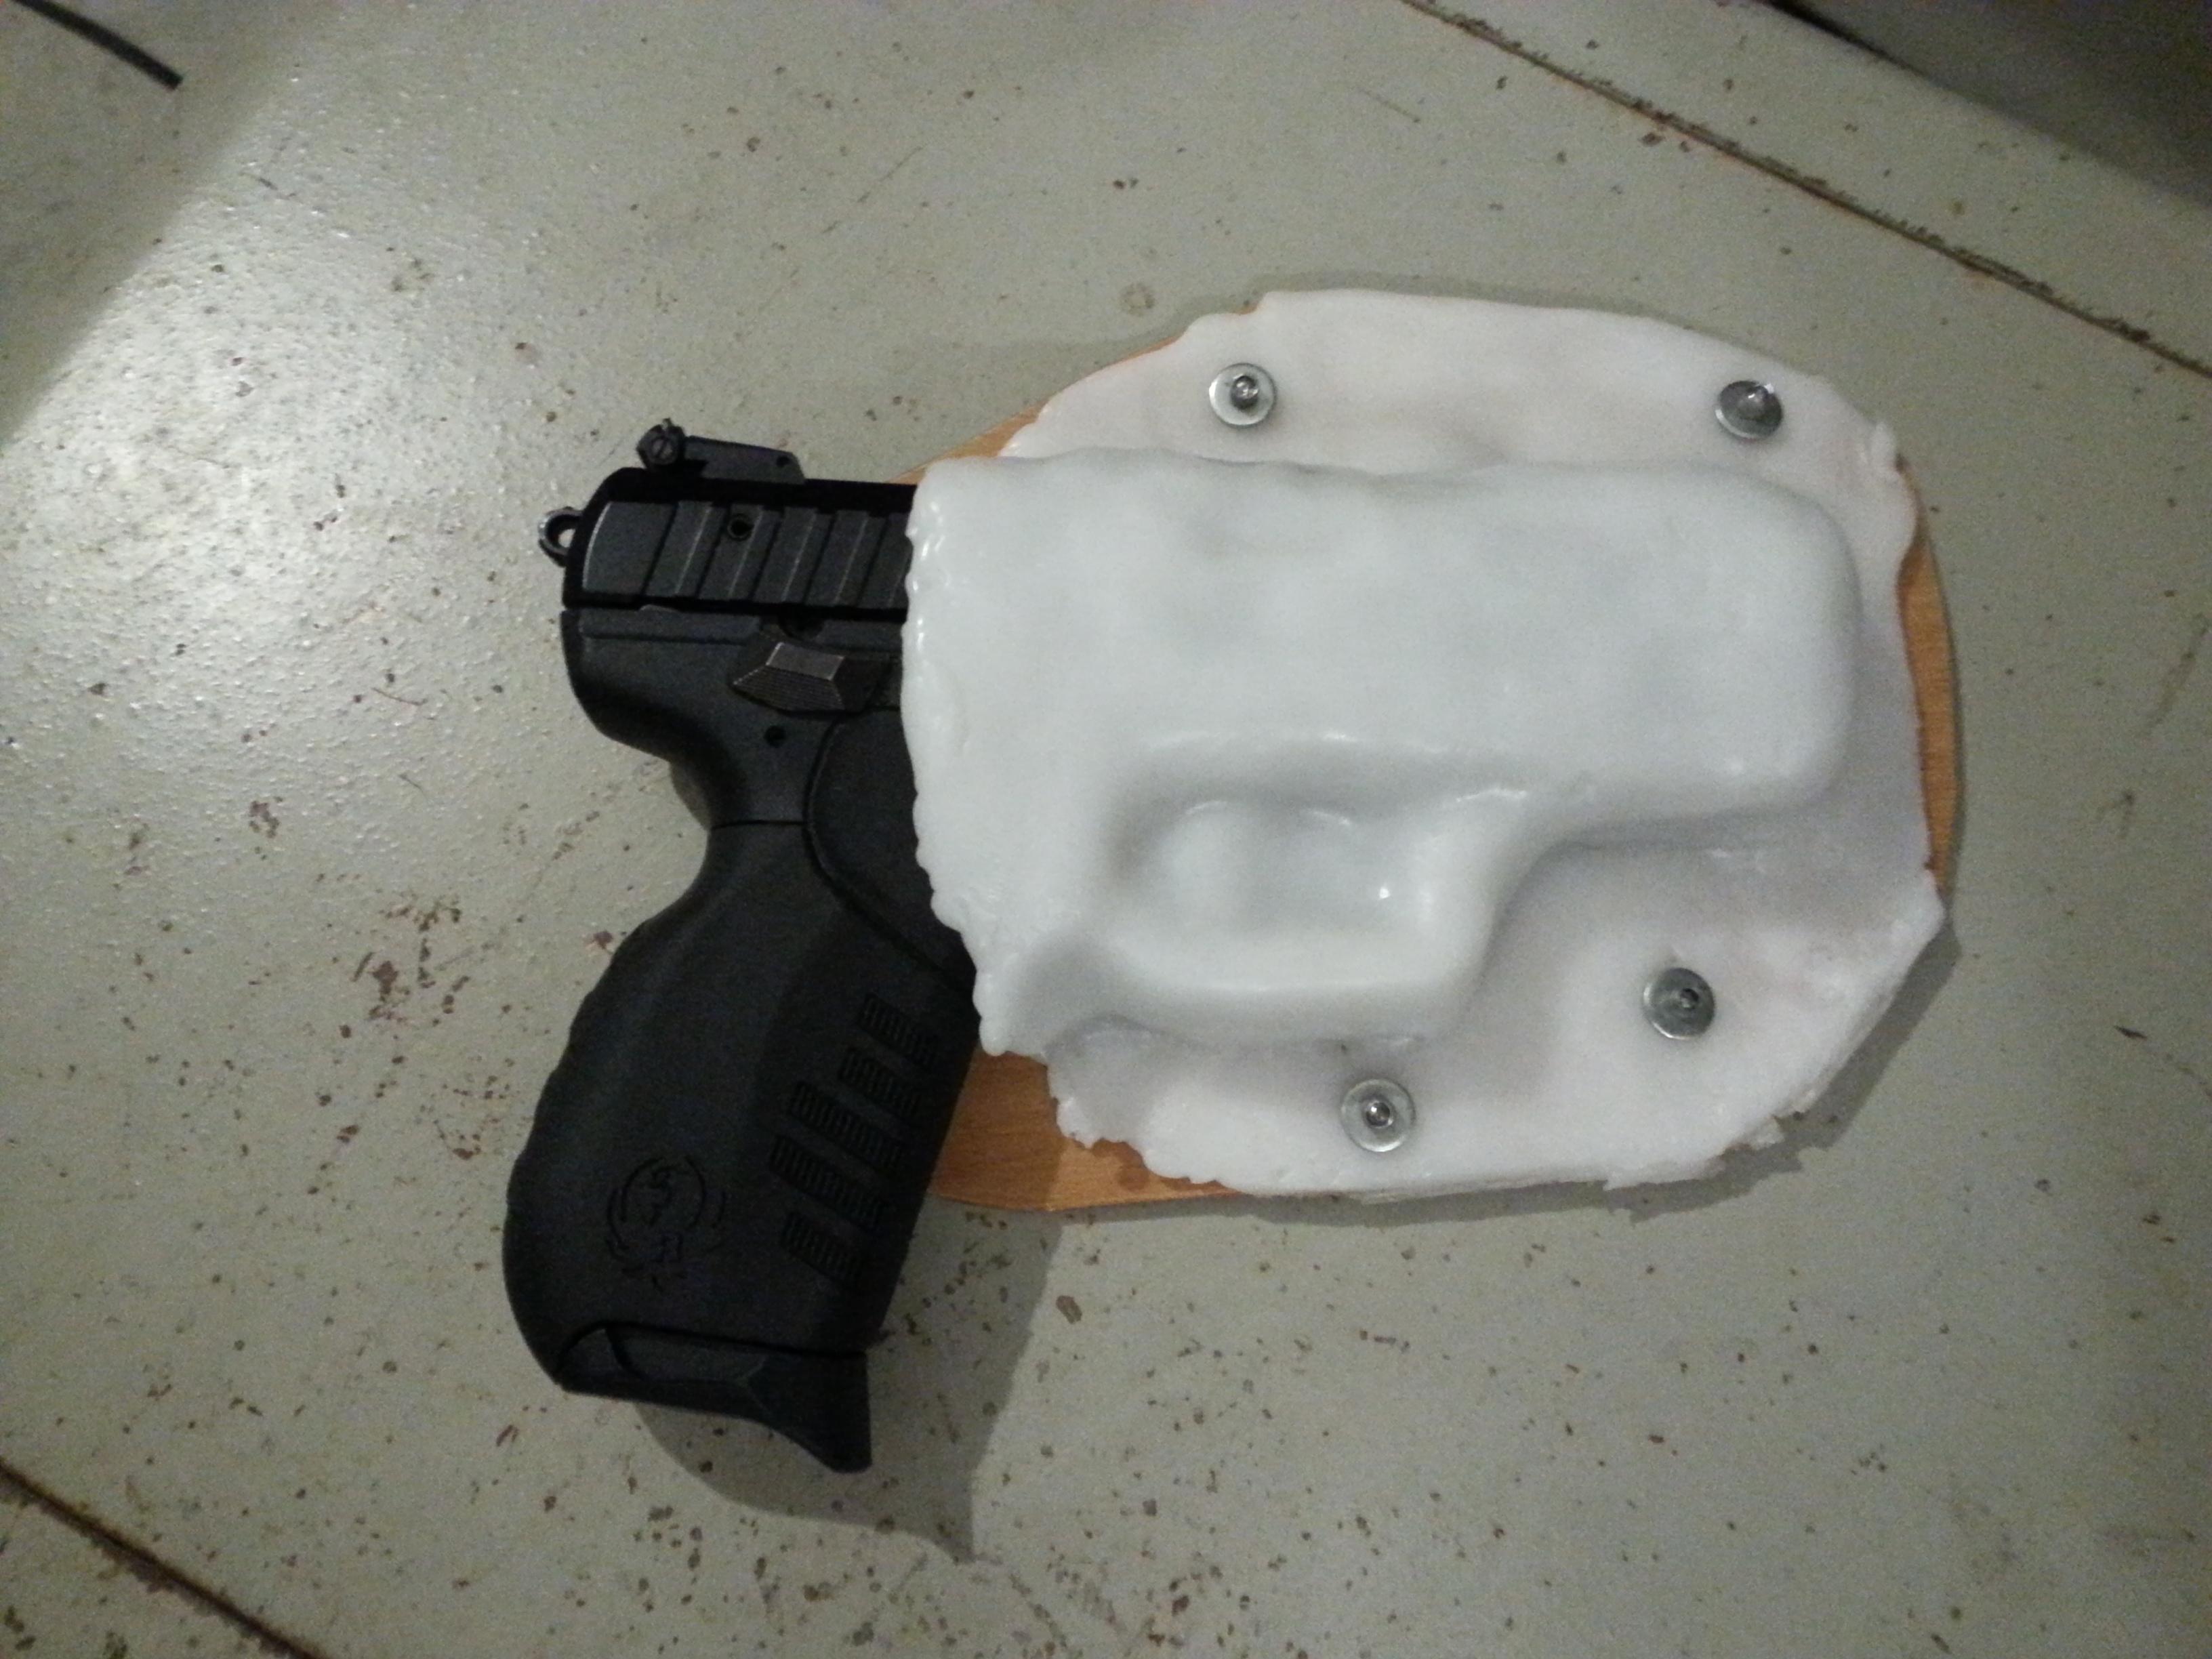 Instamorph pistol holster